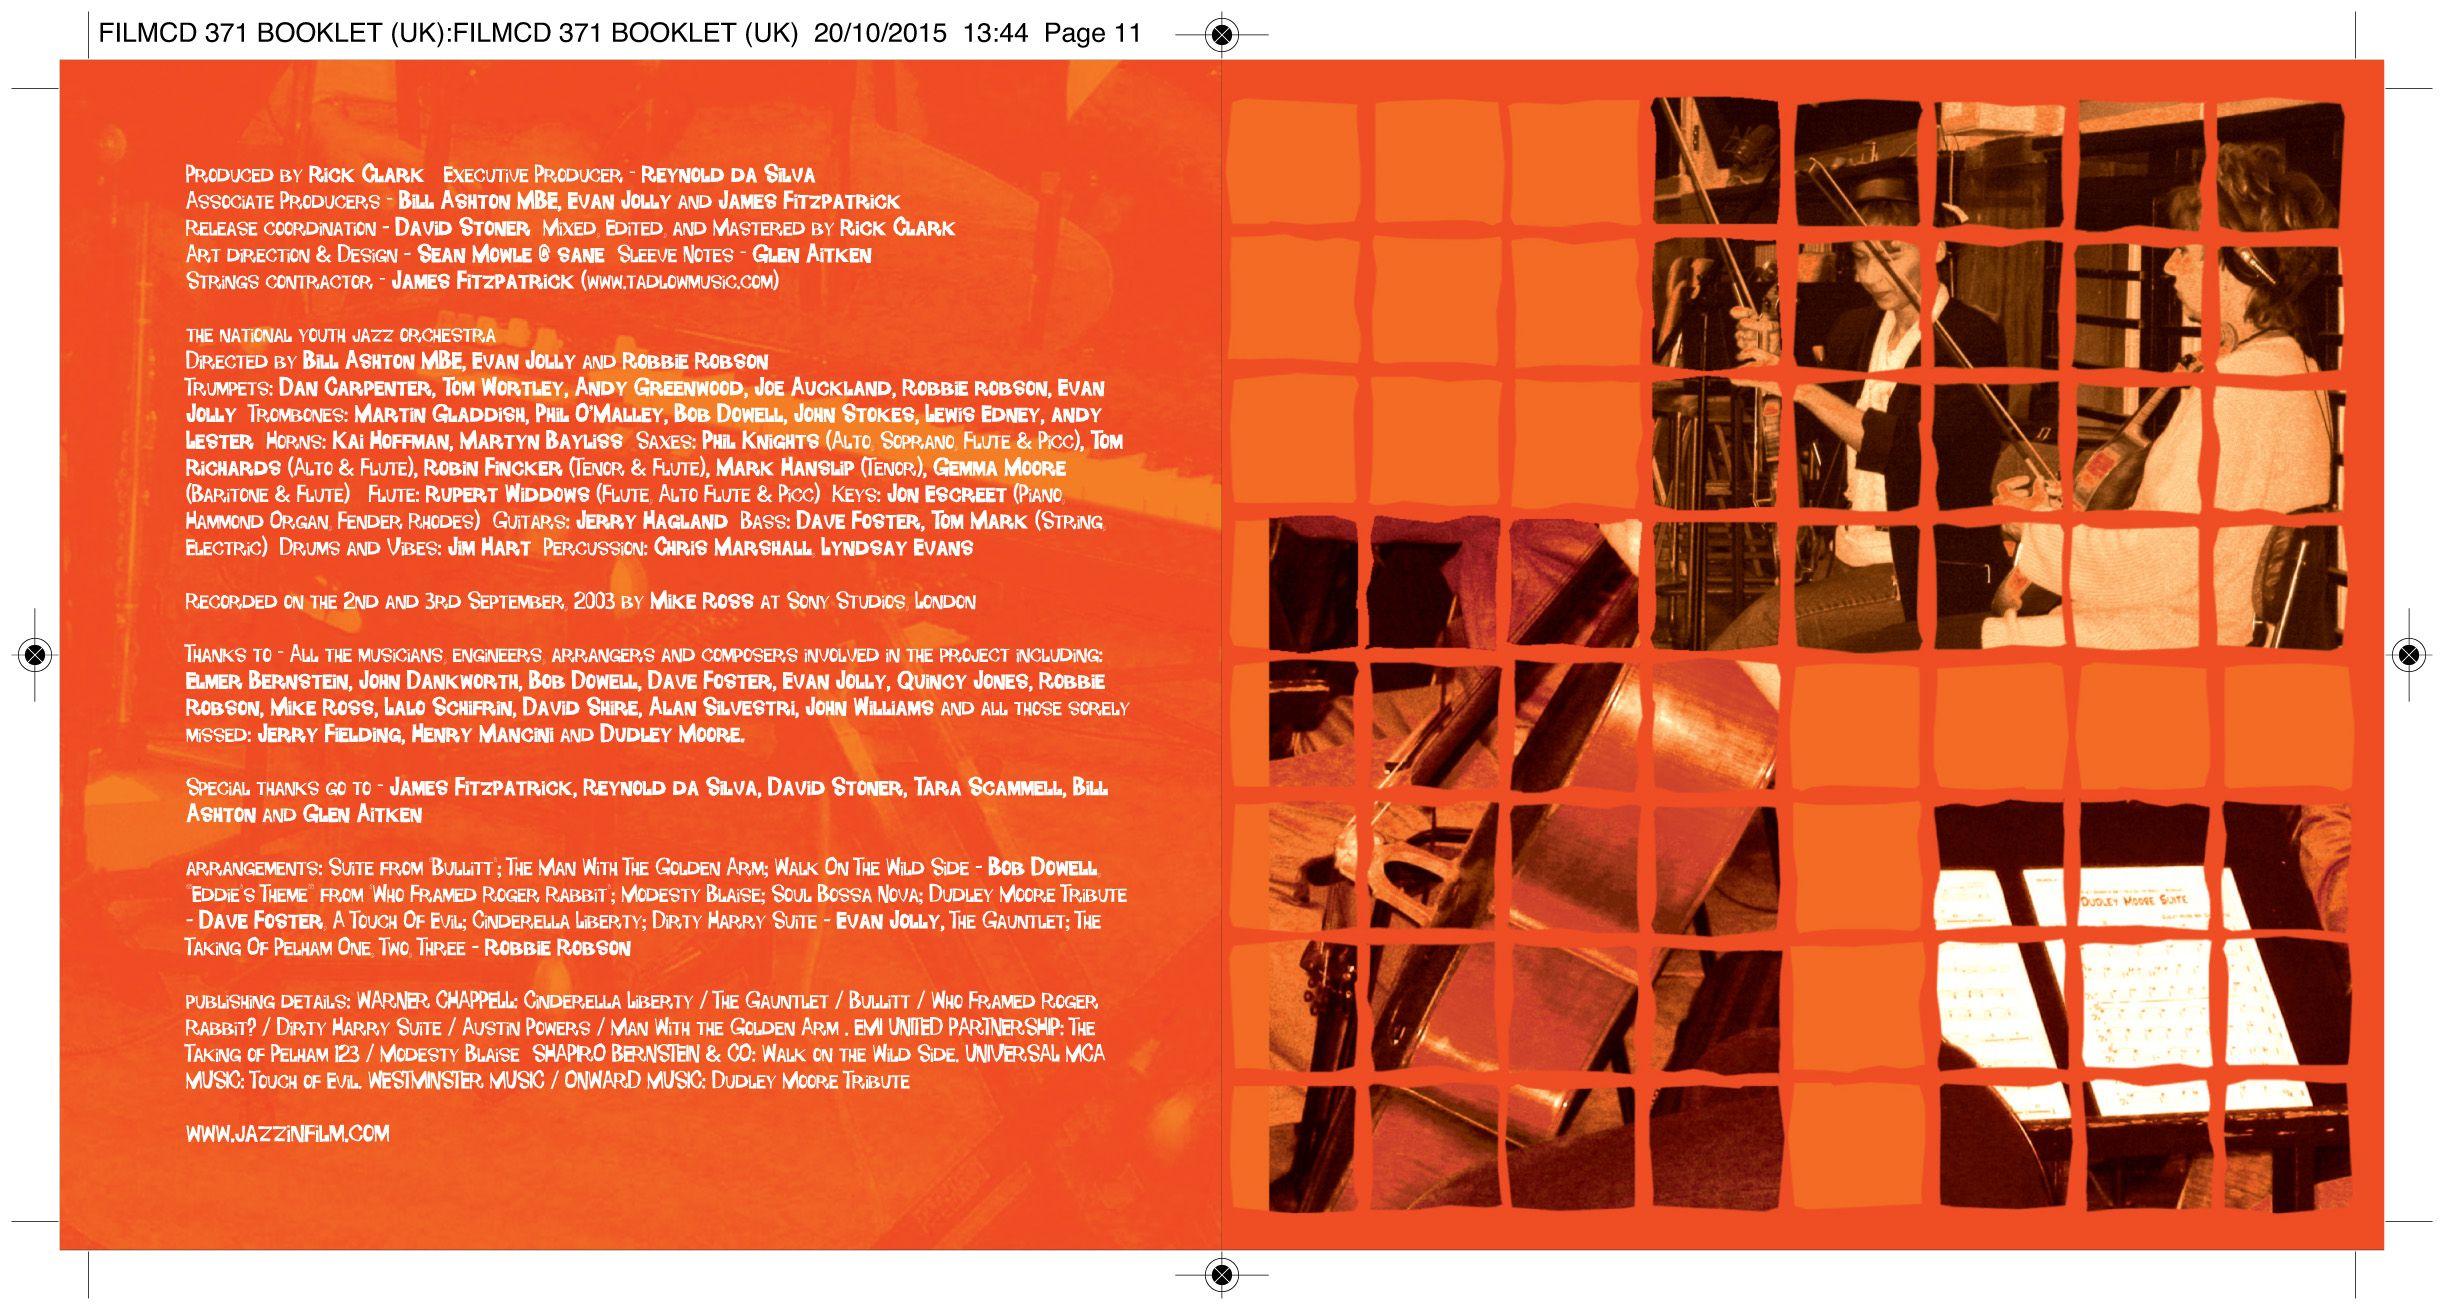 Jazz In Film CD booklet inside spread. Client: Silva Screen Records. Circa 2003. © Sean Mowle.